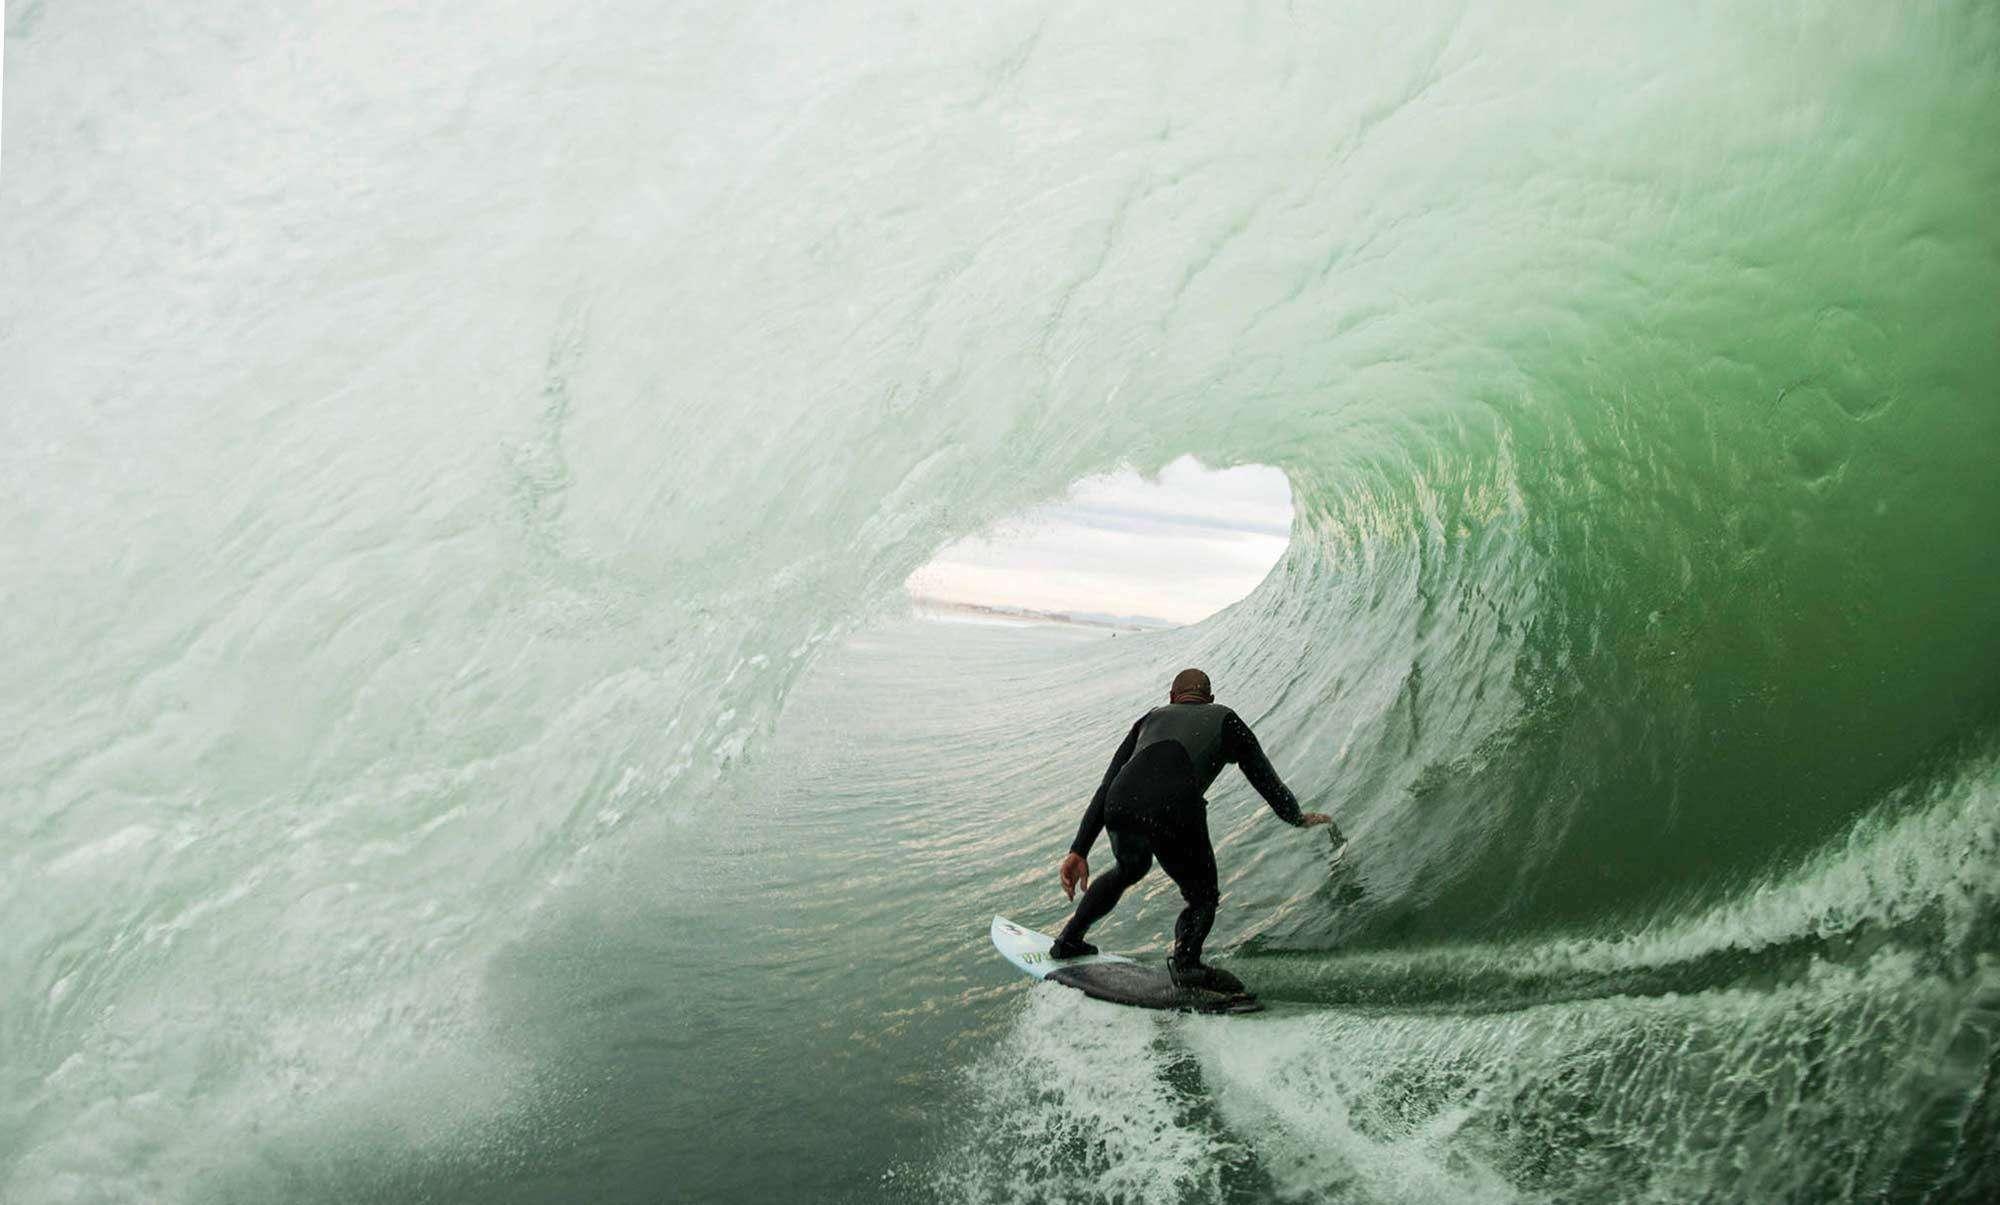 shane_dorian_furnace_wetsuit_v2_2_2